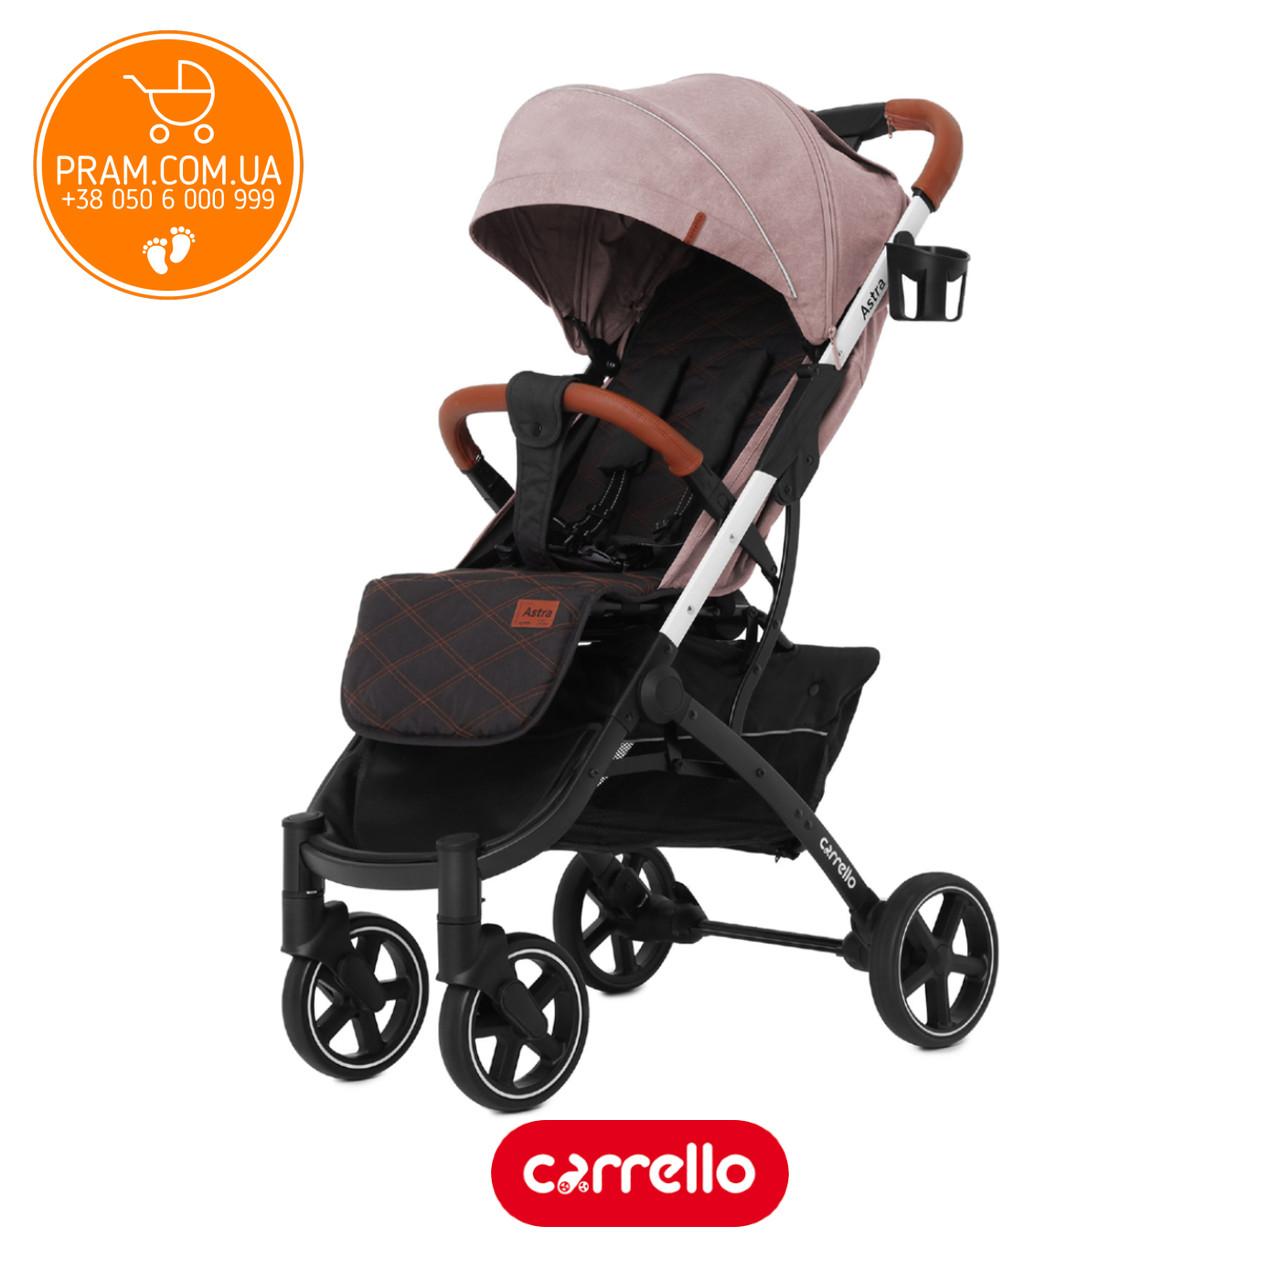 CARRELLO ASTRA CRL-5505 прогулочная коляска Apricot Pink Розовый